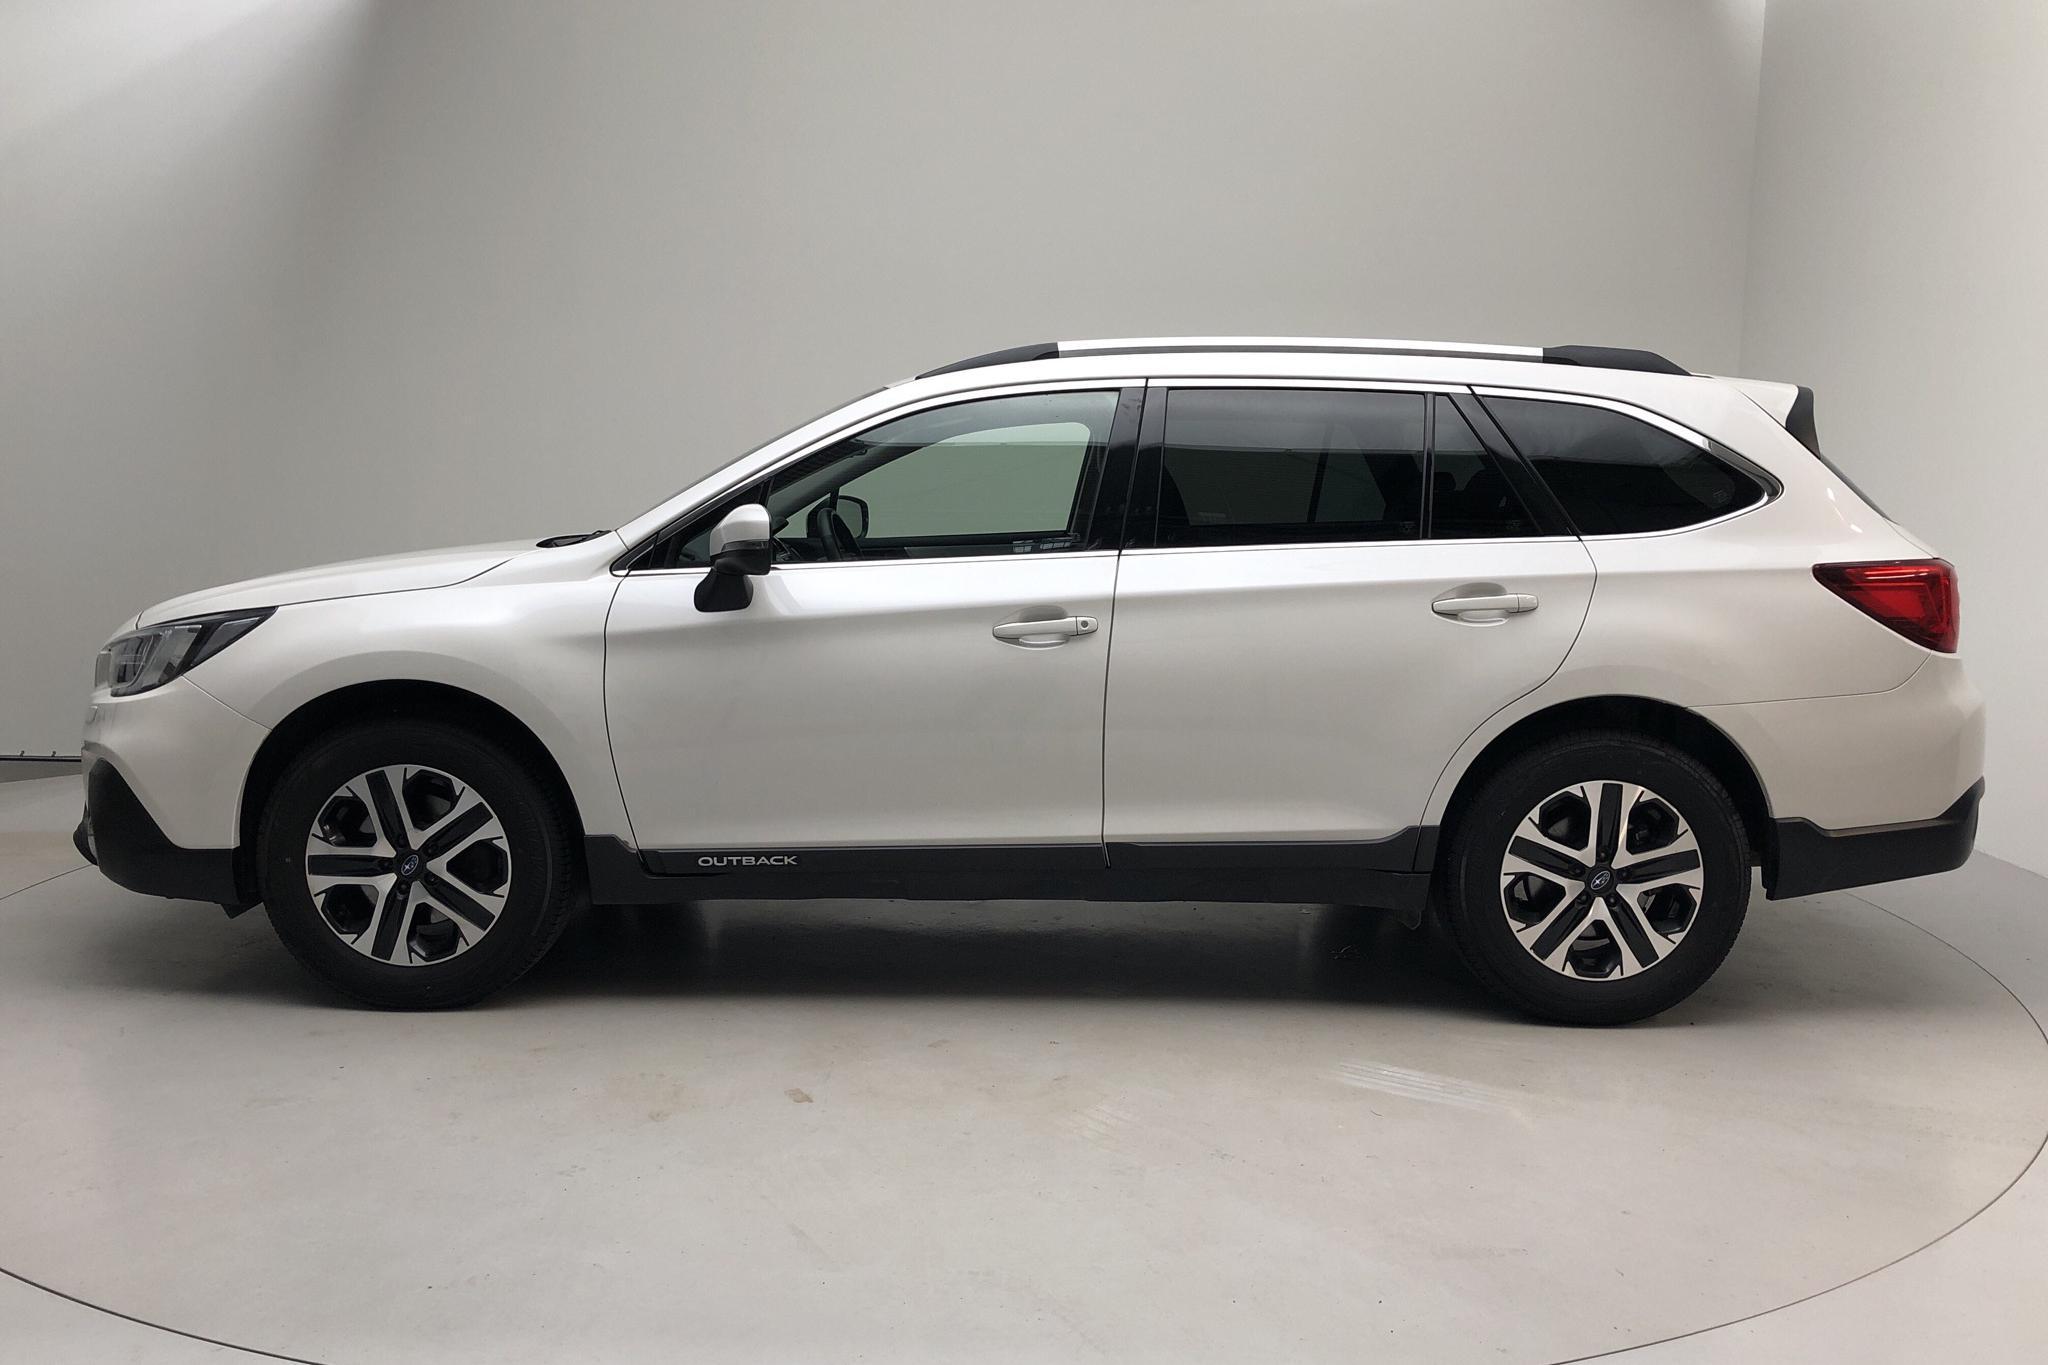 Subaru Outback 2.5i 4WD (173hk) - 6 176 mil - Automat - vit - 2019